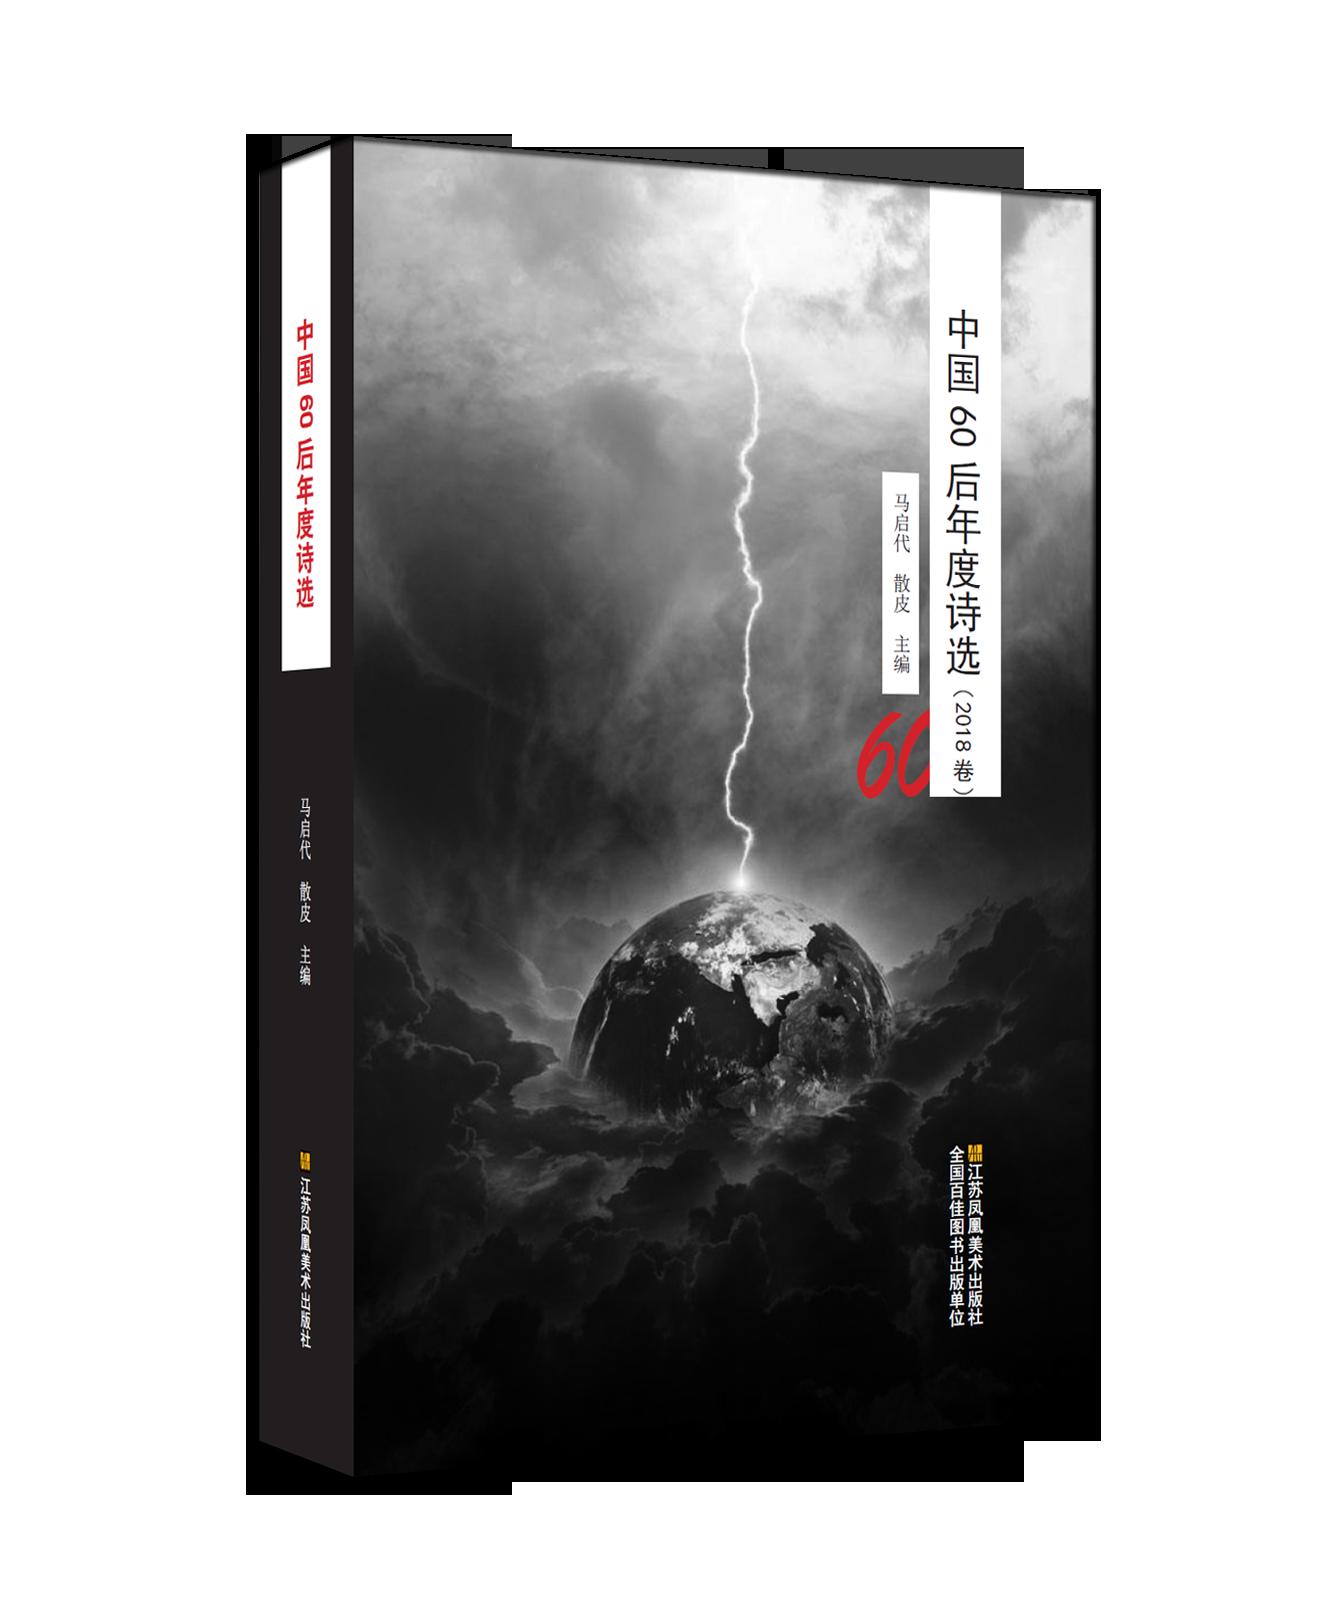 中国60后诗选.png